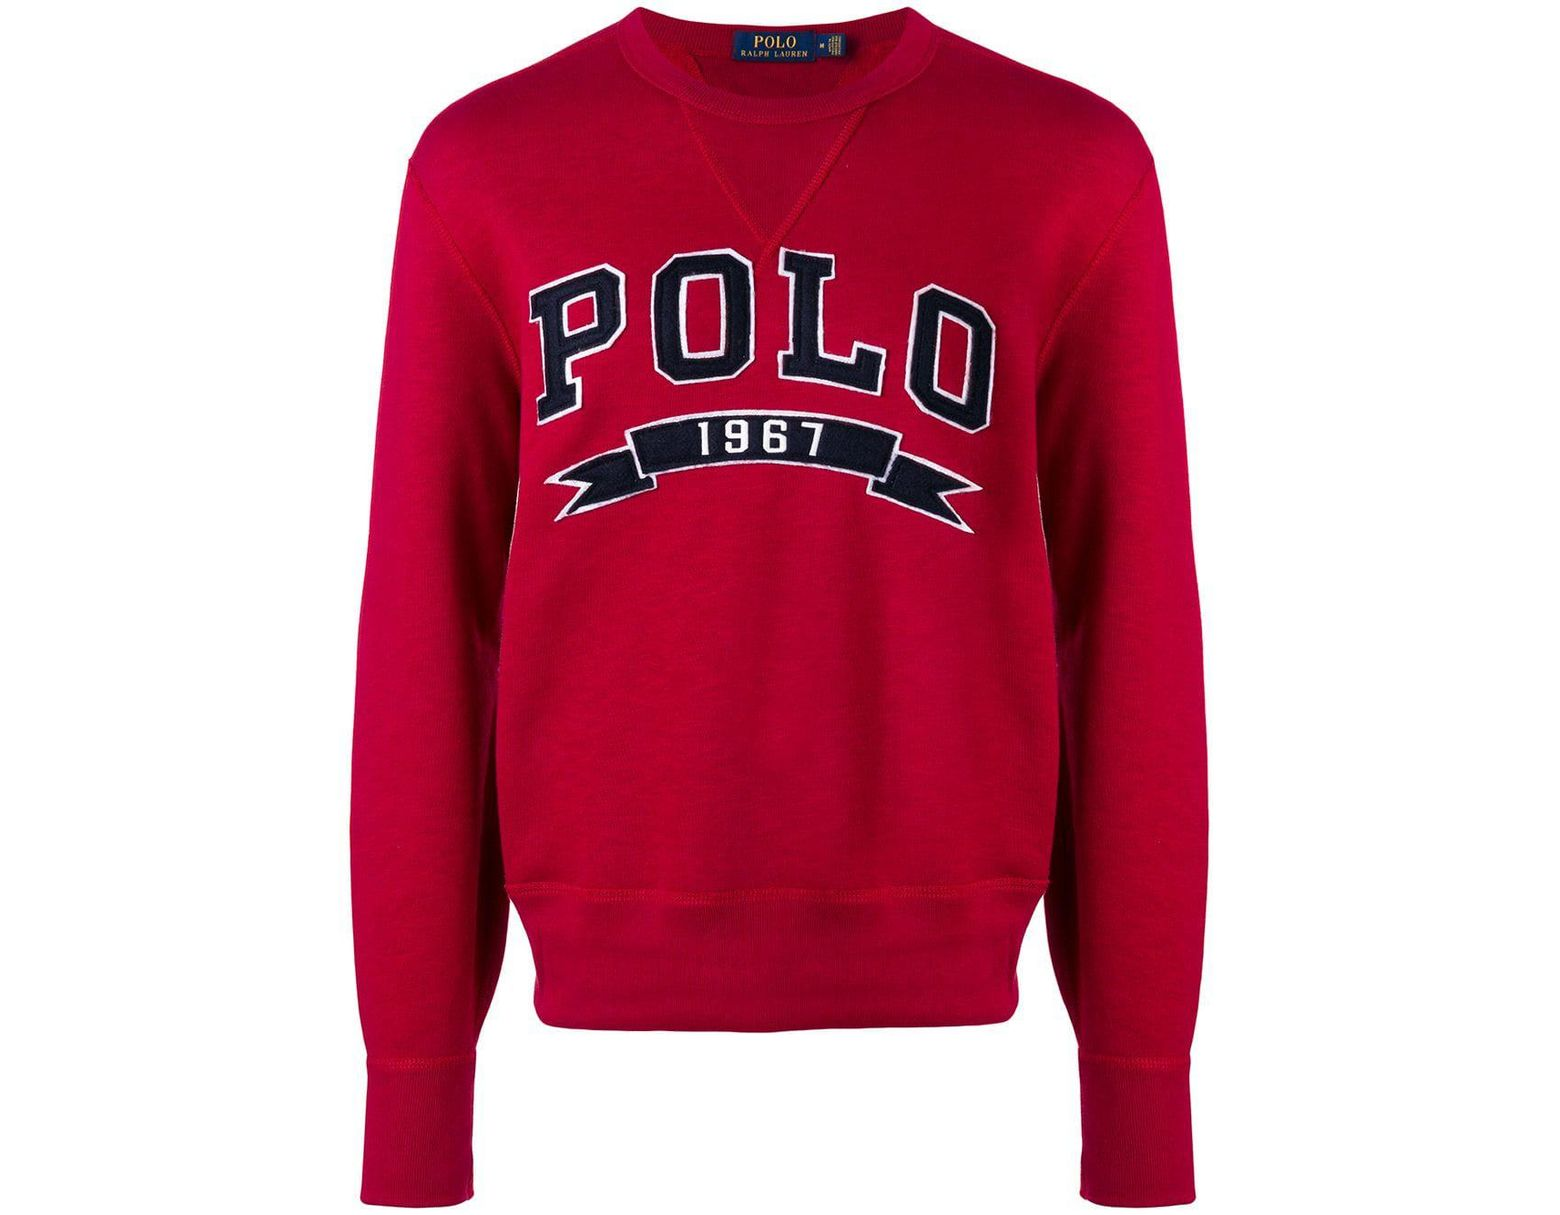 1967 Men's Men's 1967 Polo Sweatshirt Polo Sweatshirt Red Red sQrCxthd